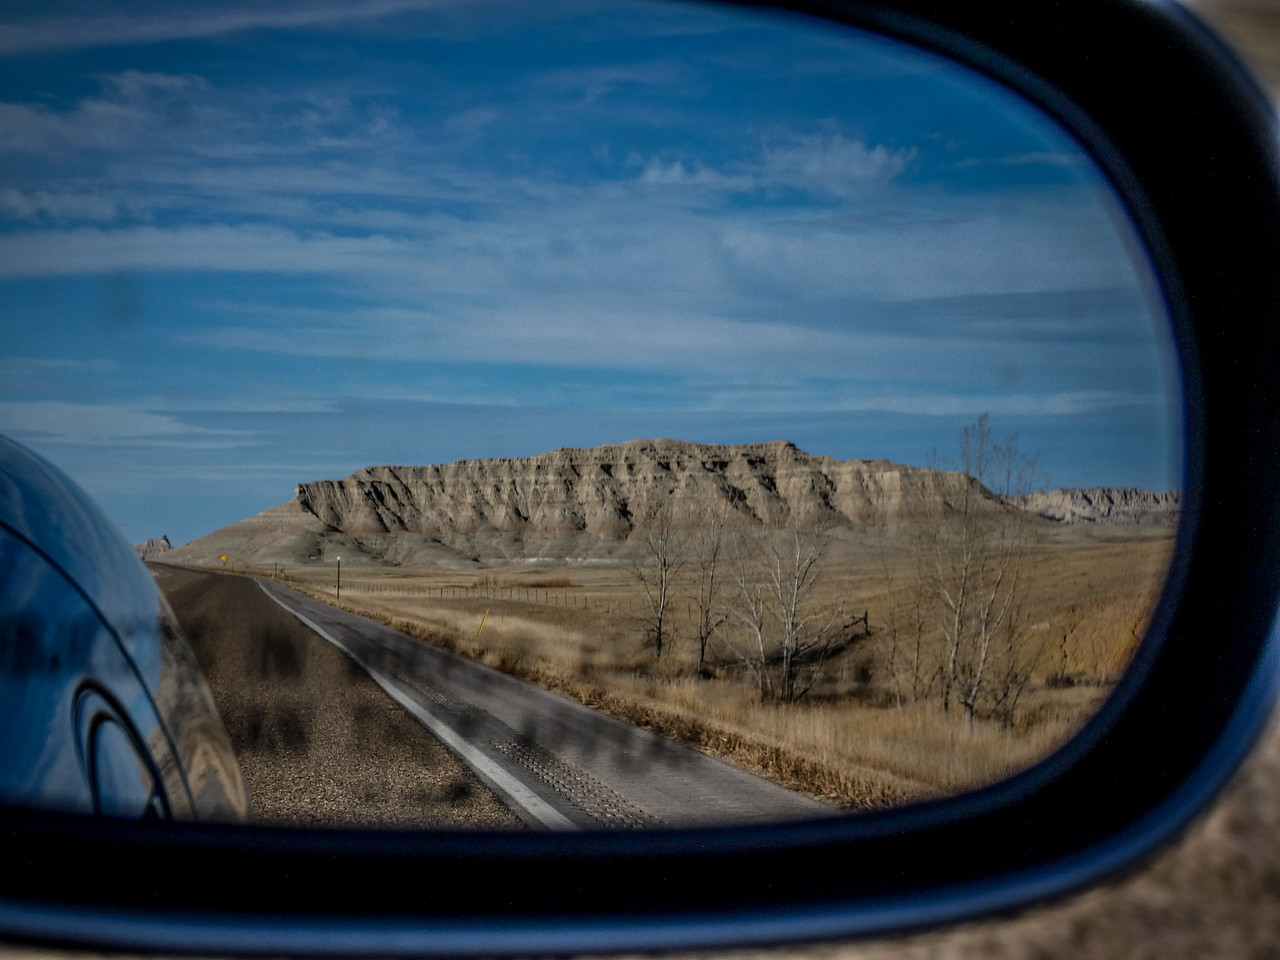 Badlands in the Rear View Mirror